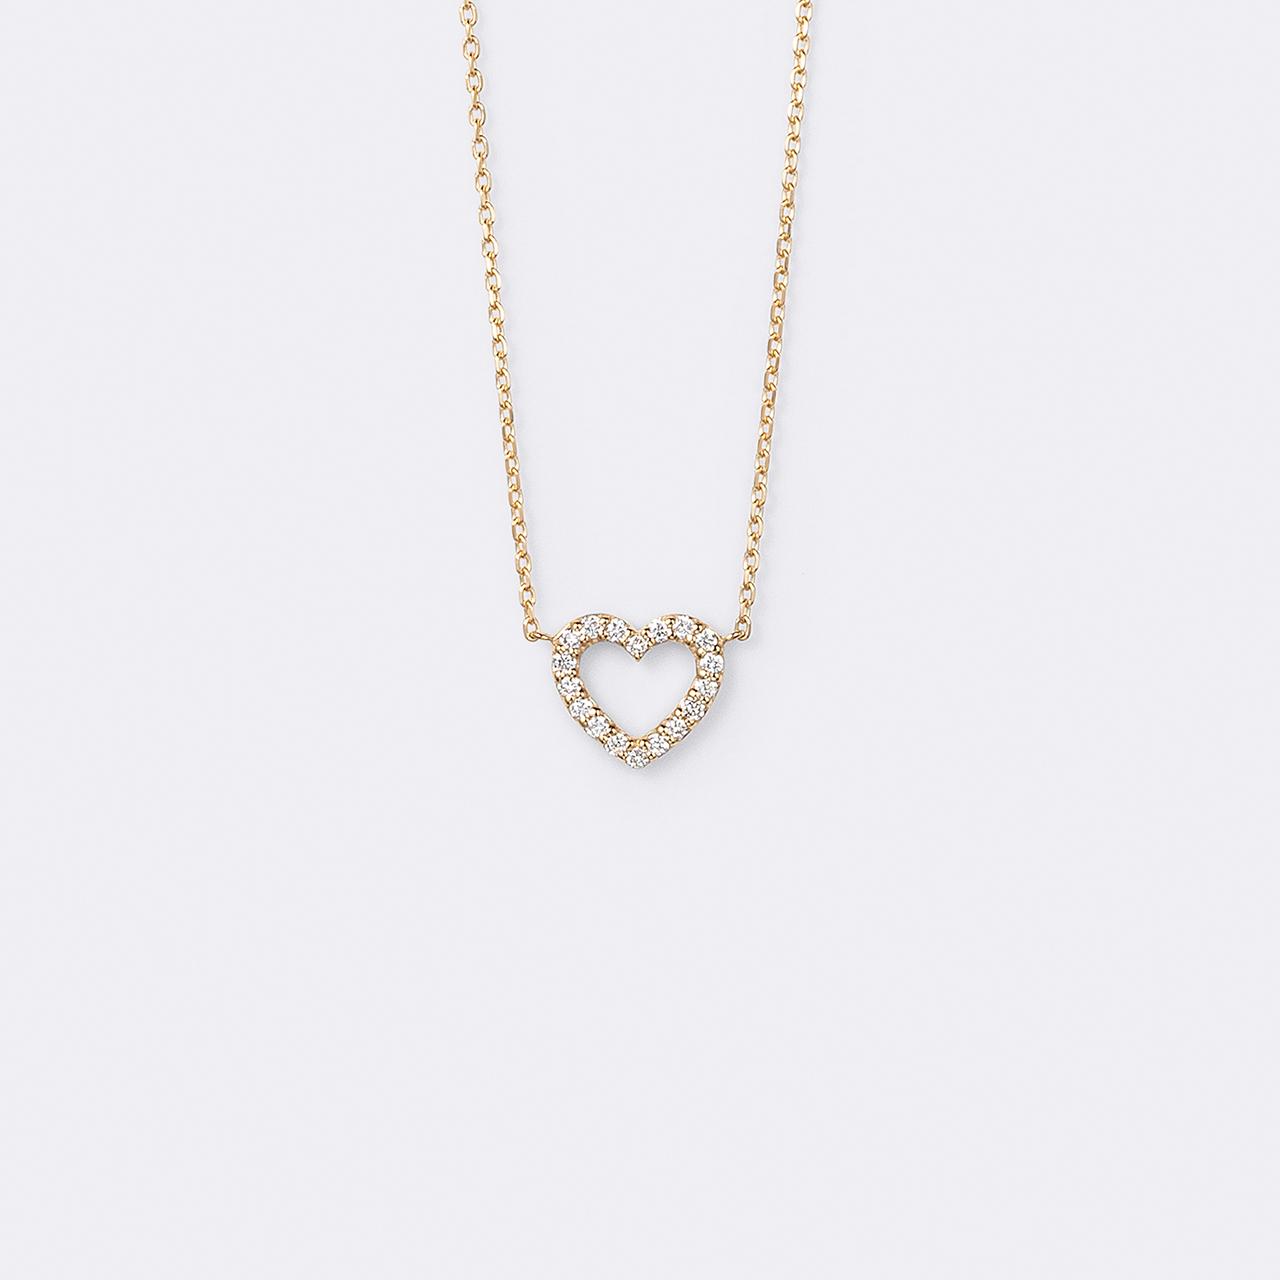 Le Coeur Necklace K18YG( ルクールネックレス K18イエローゴールド)